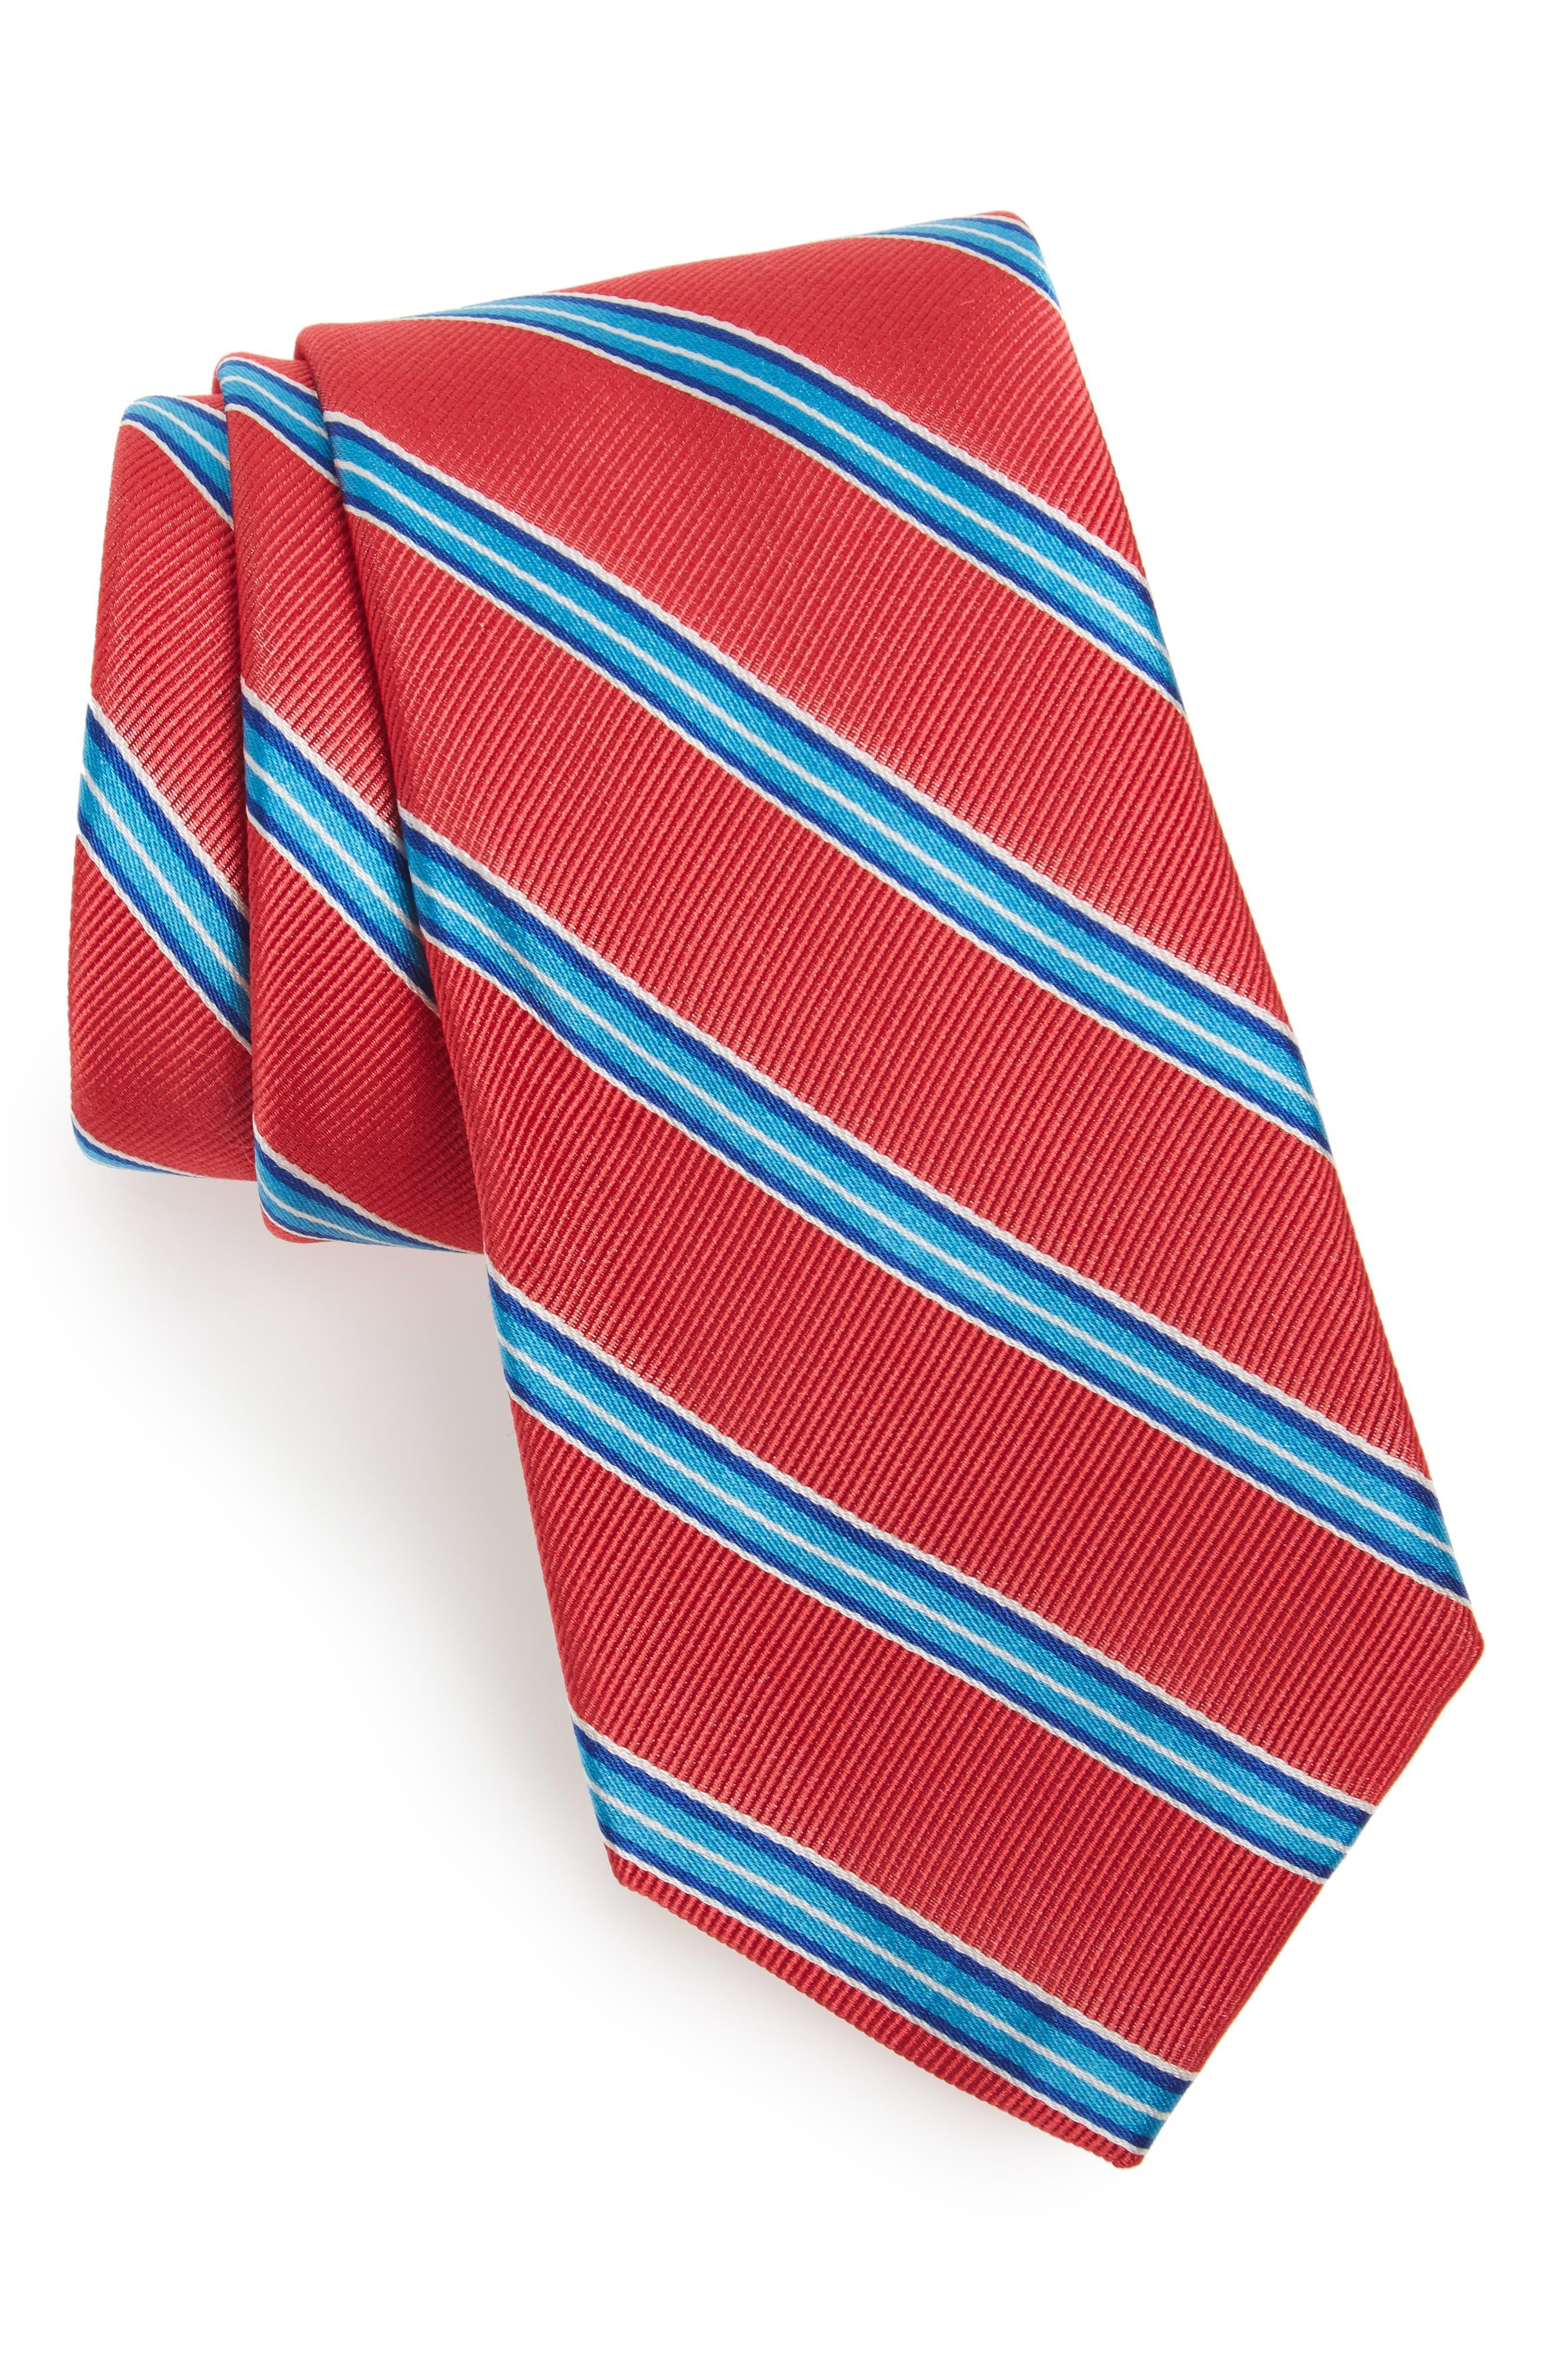 Main Image - Nordstrom Men's Shop Chester Stripe Silk Tie